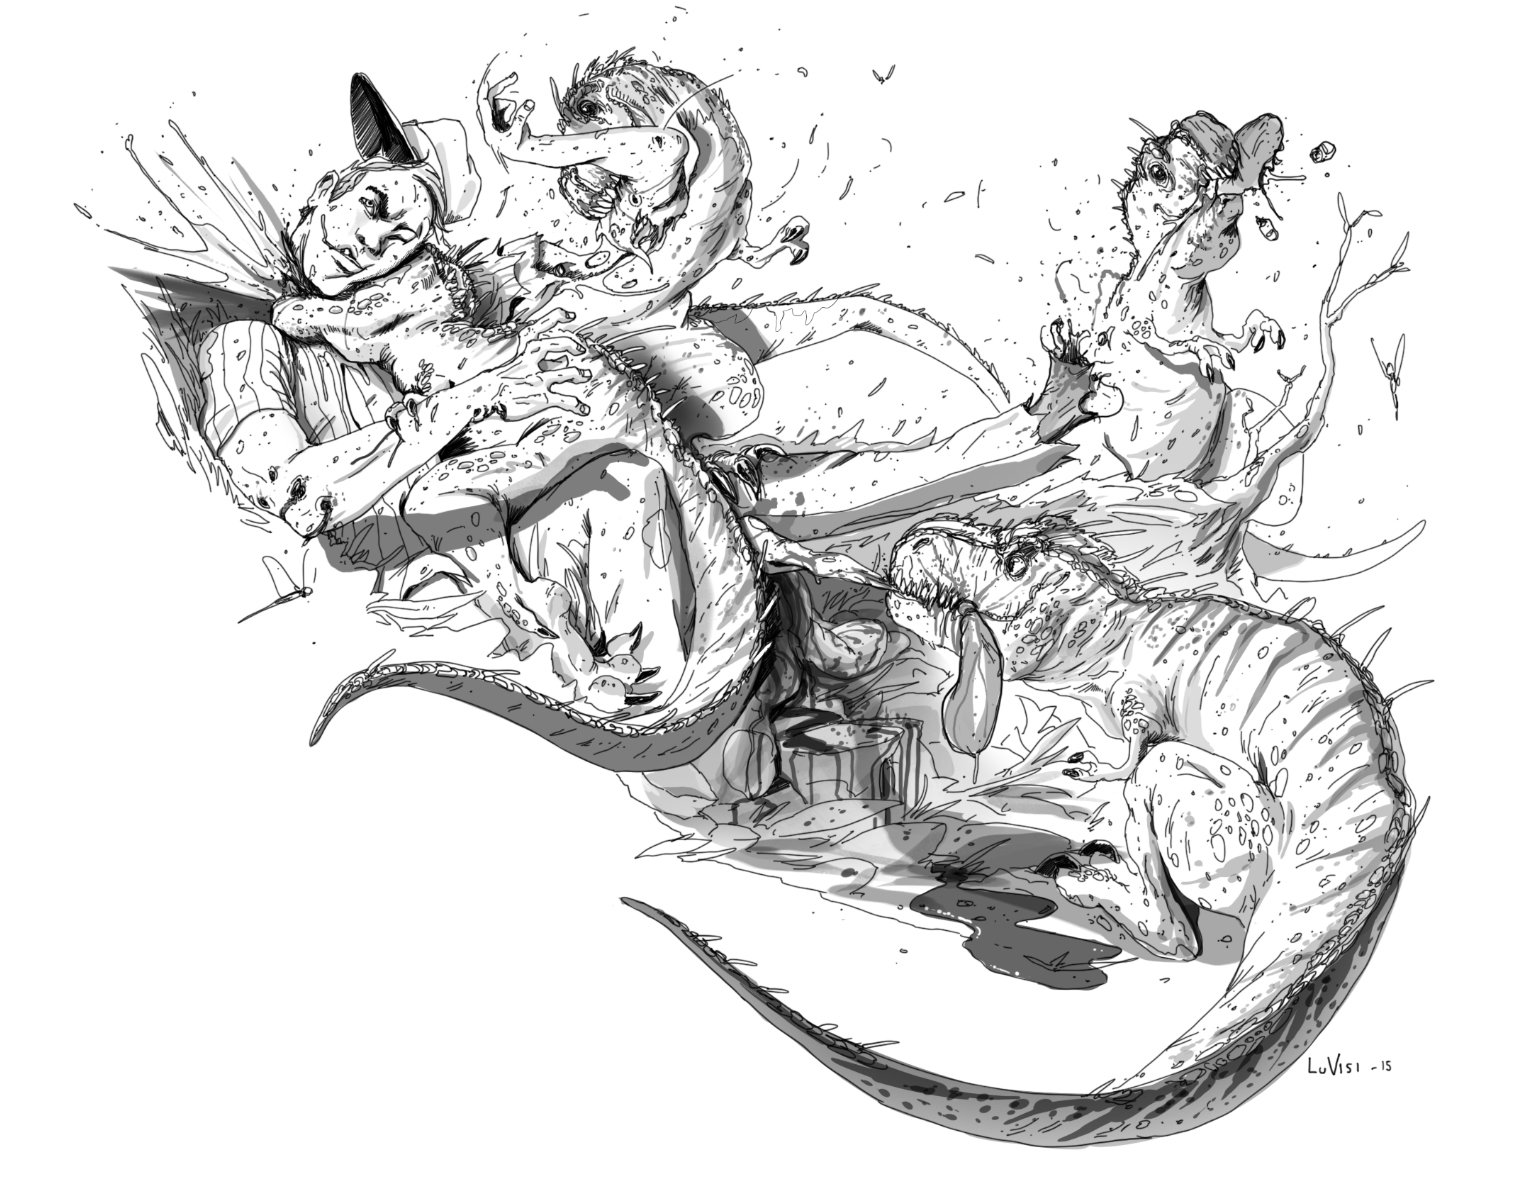 Dan luvisi dinosaurrex